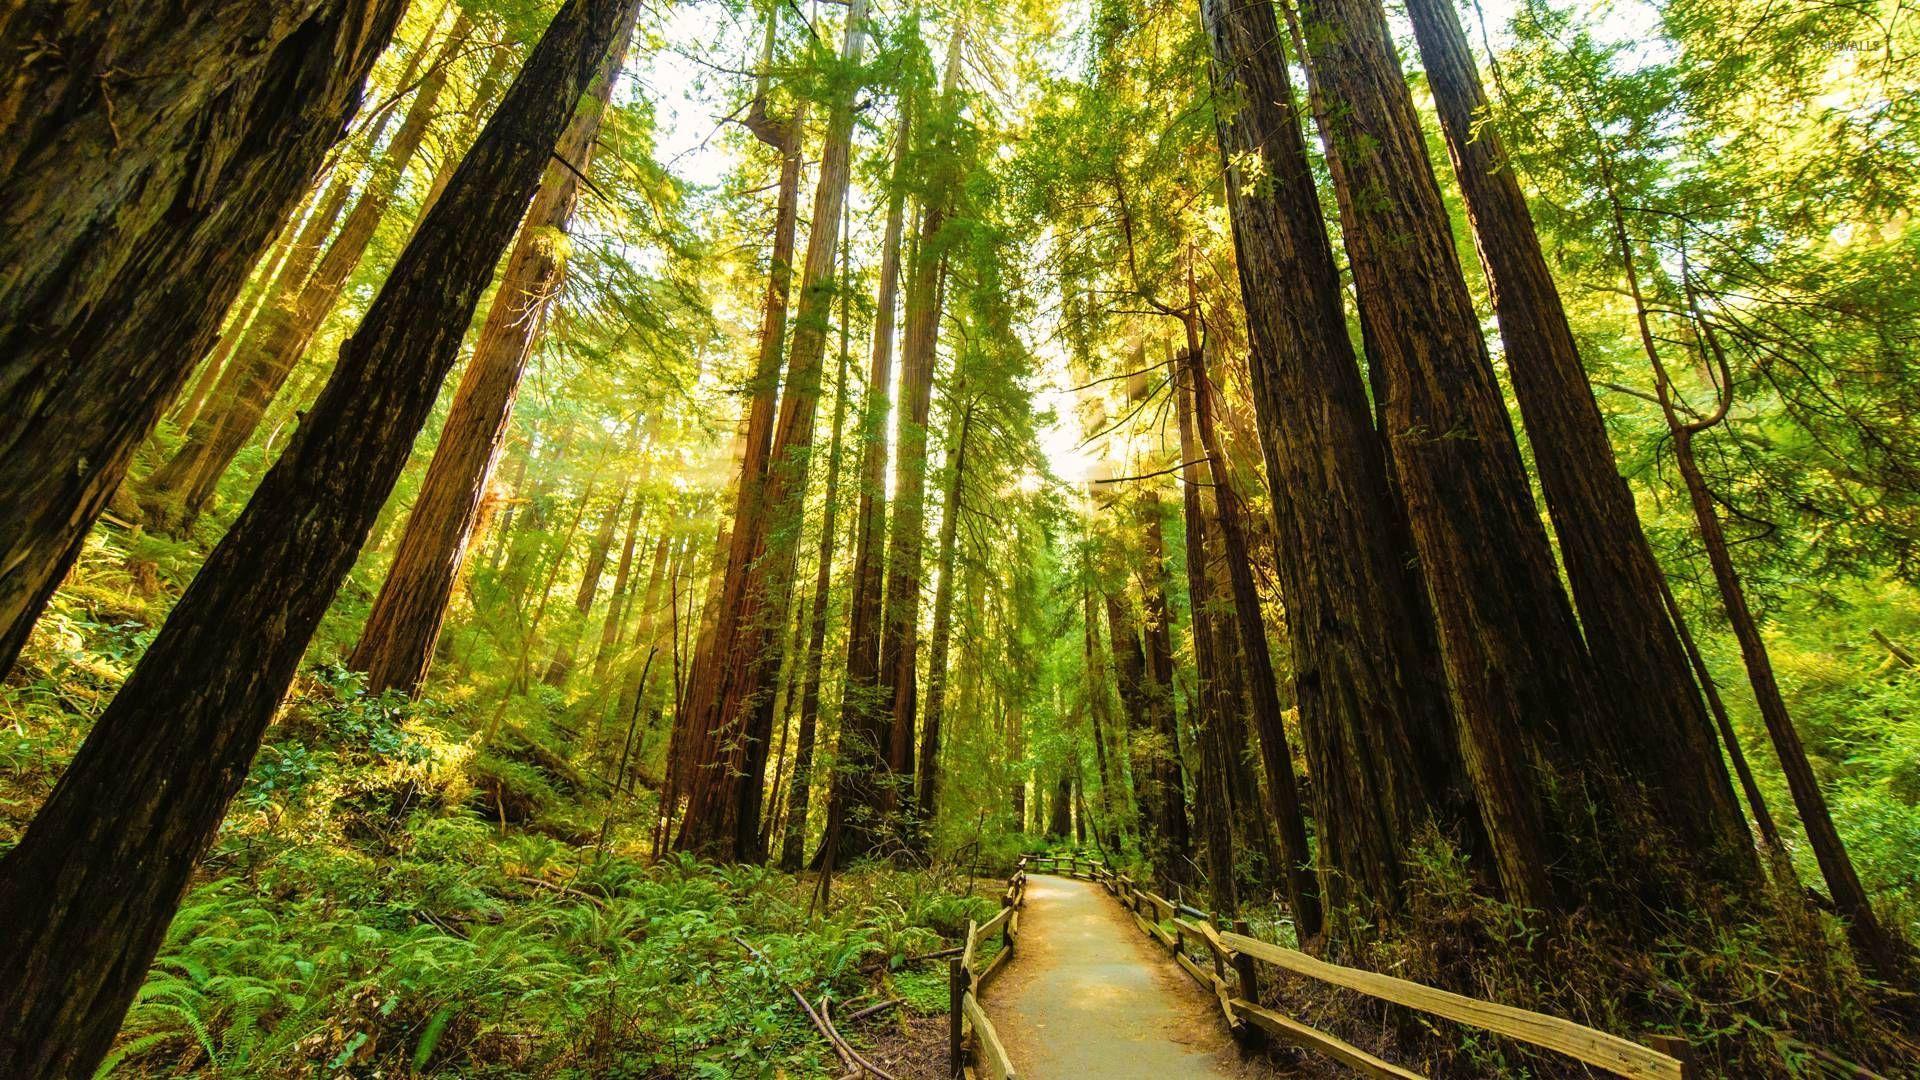 4k wallpaper nature redwoods - photo #43